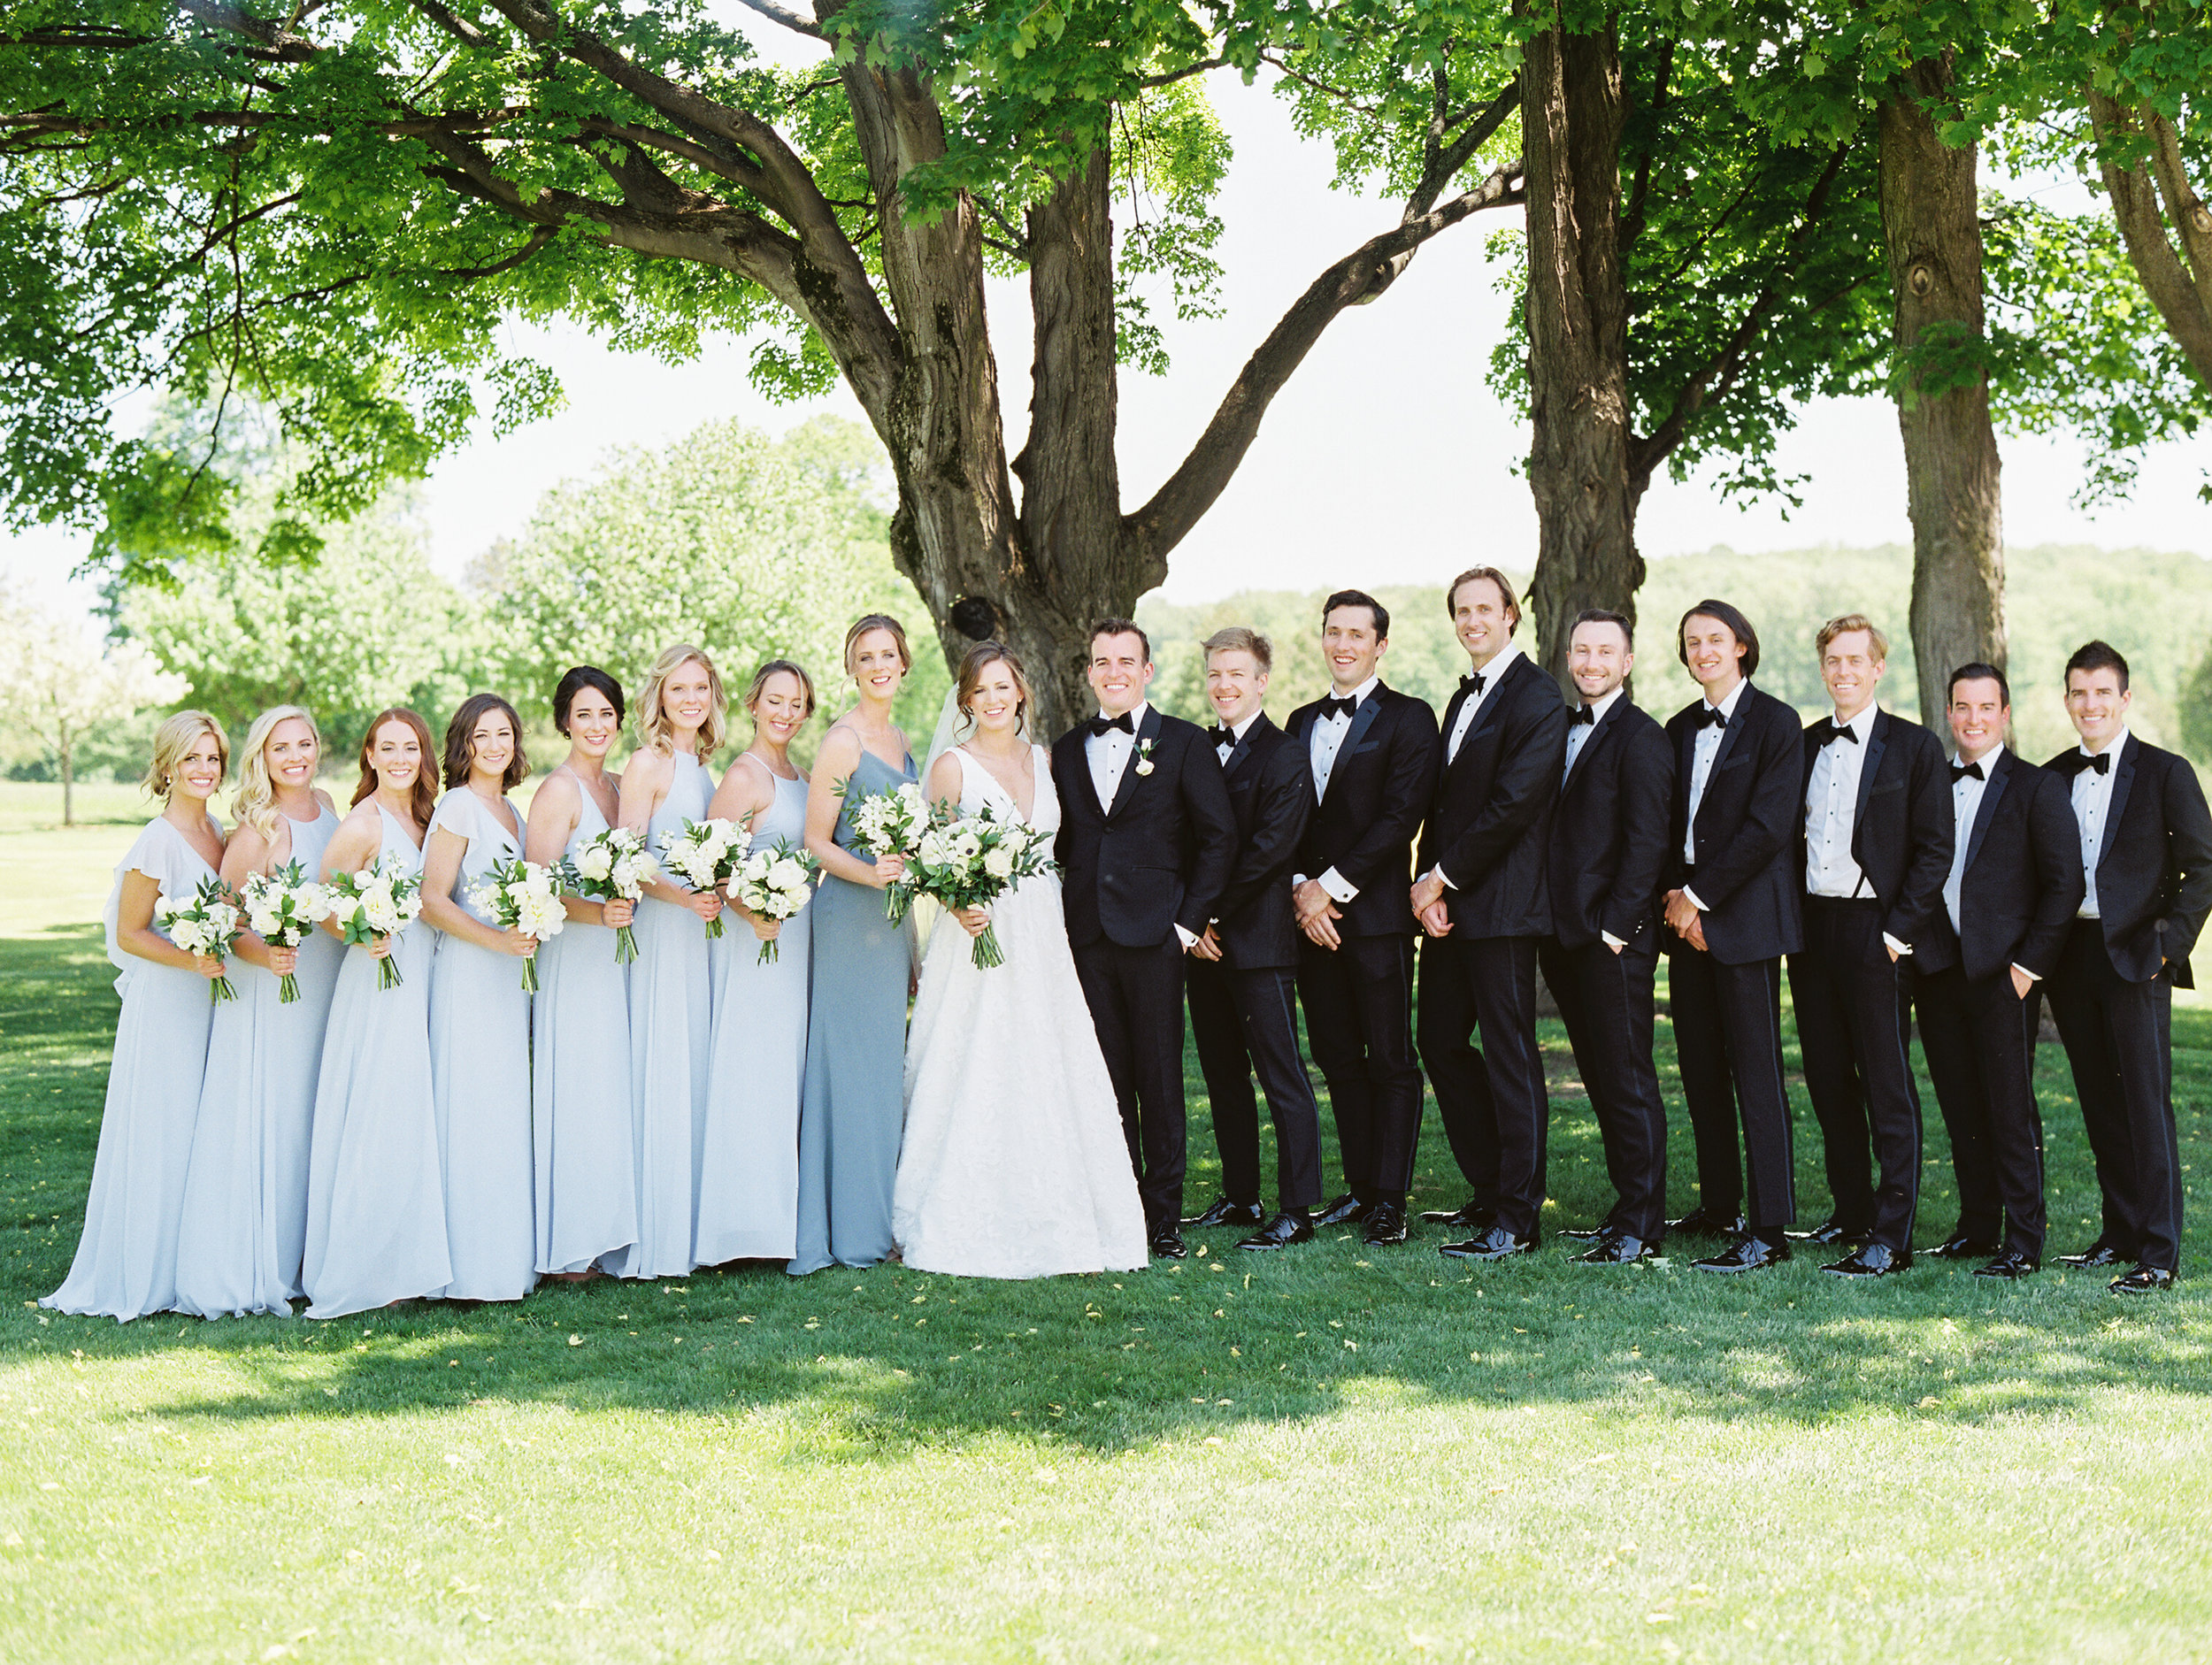 DeGuilio+Wedding+Bridal+Partyf-77.jpg